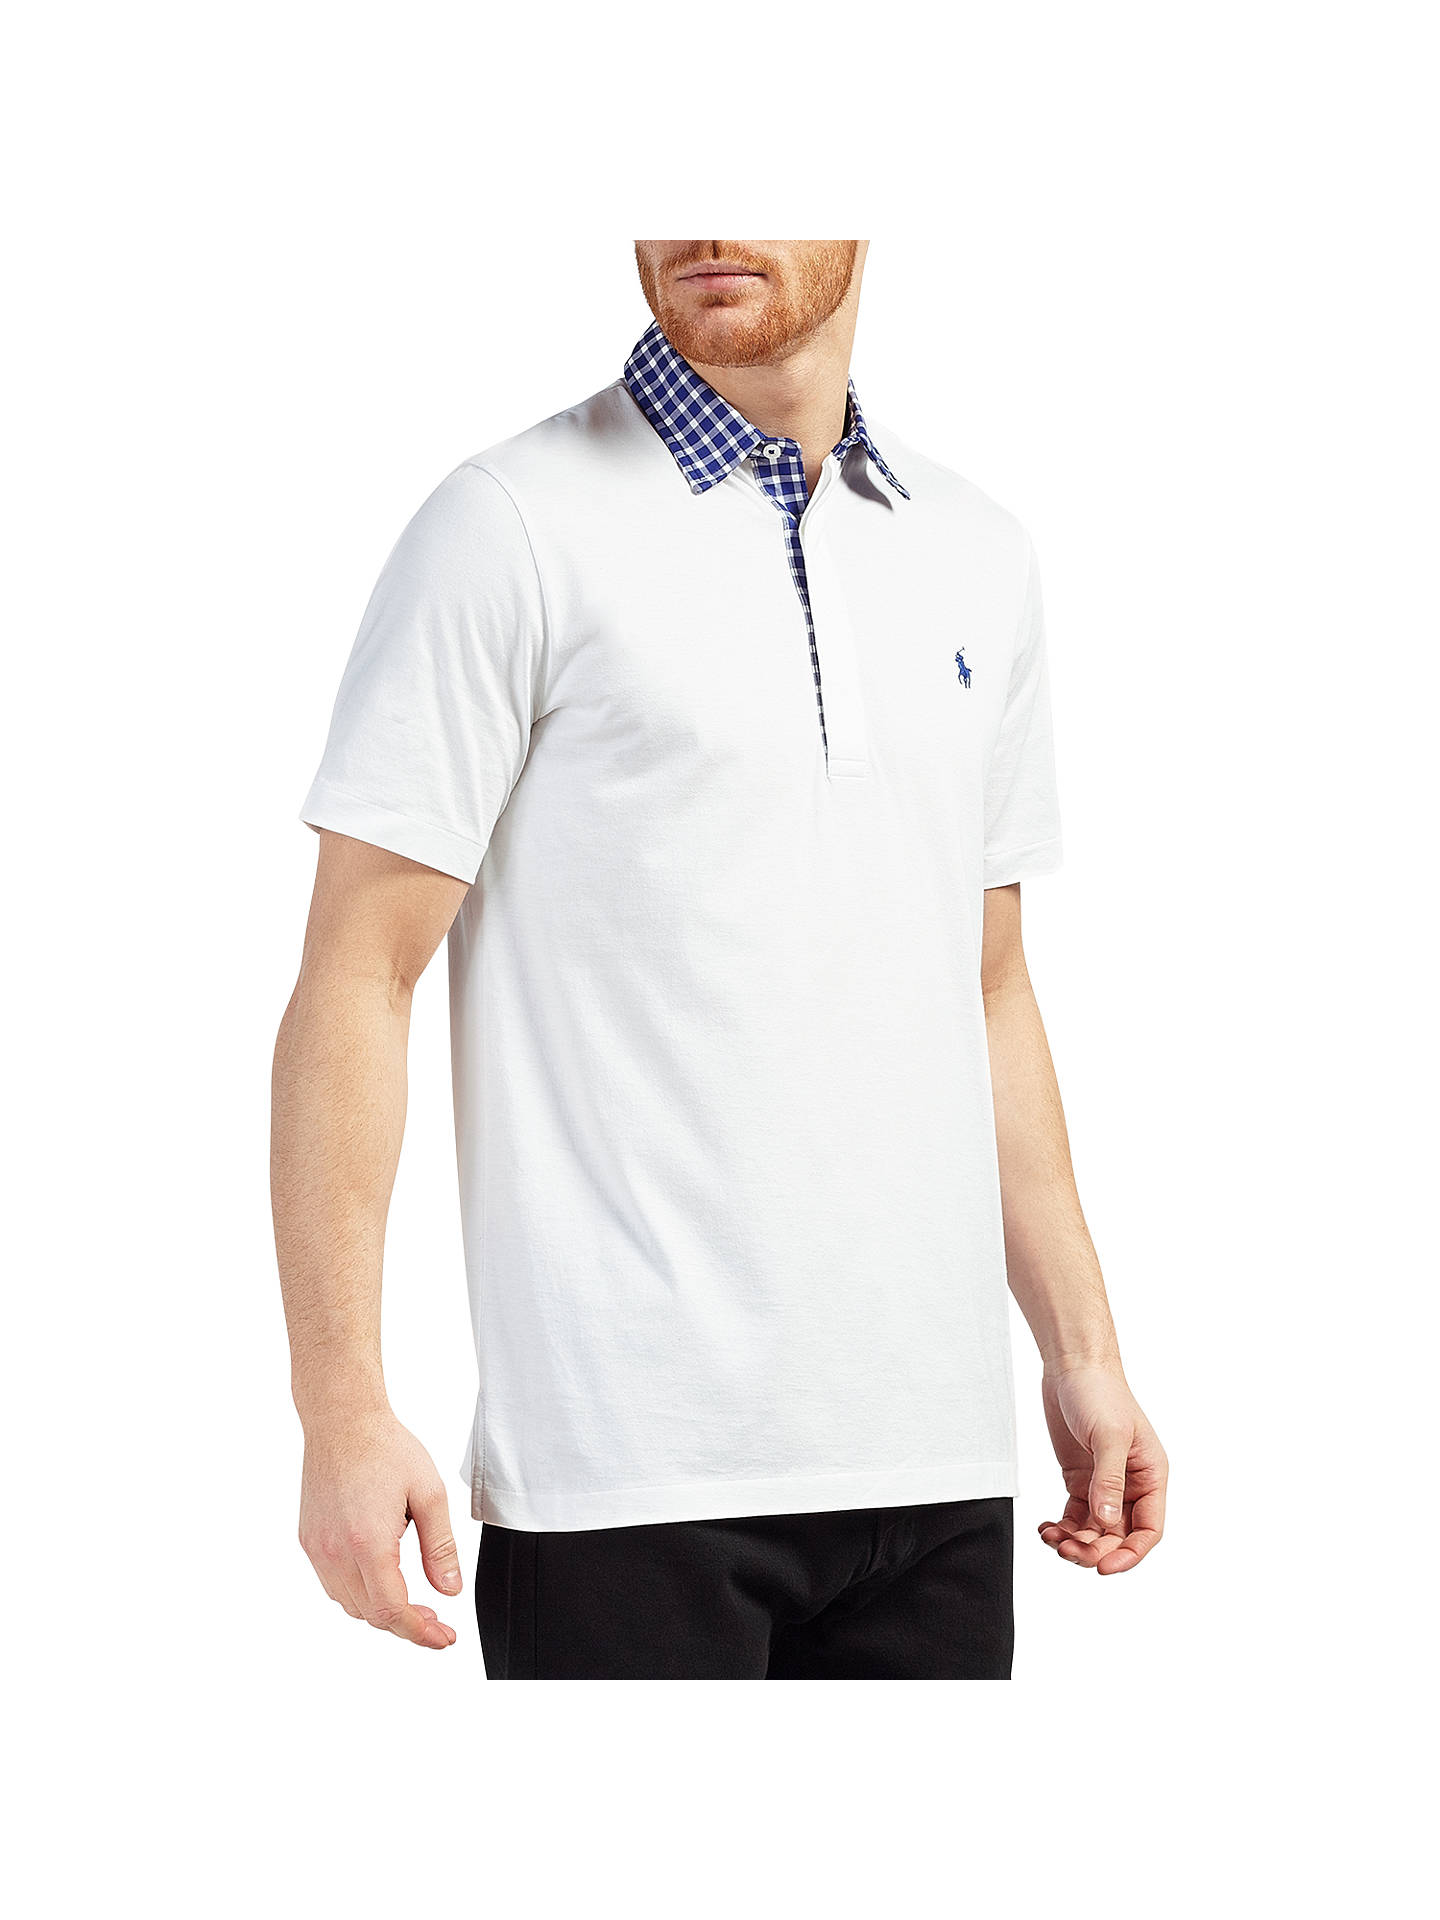 ff792812e Polo Golf by Ralph Lauren Vintage Lisle Pima Cotton Polo Shirt ...